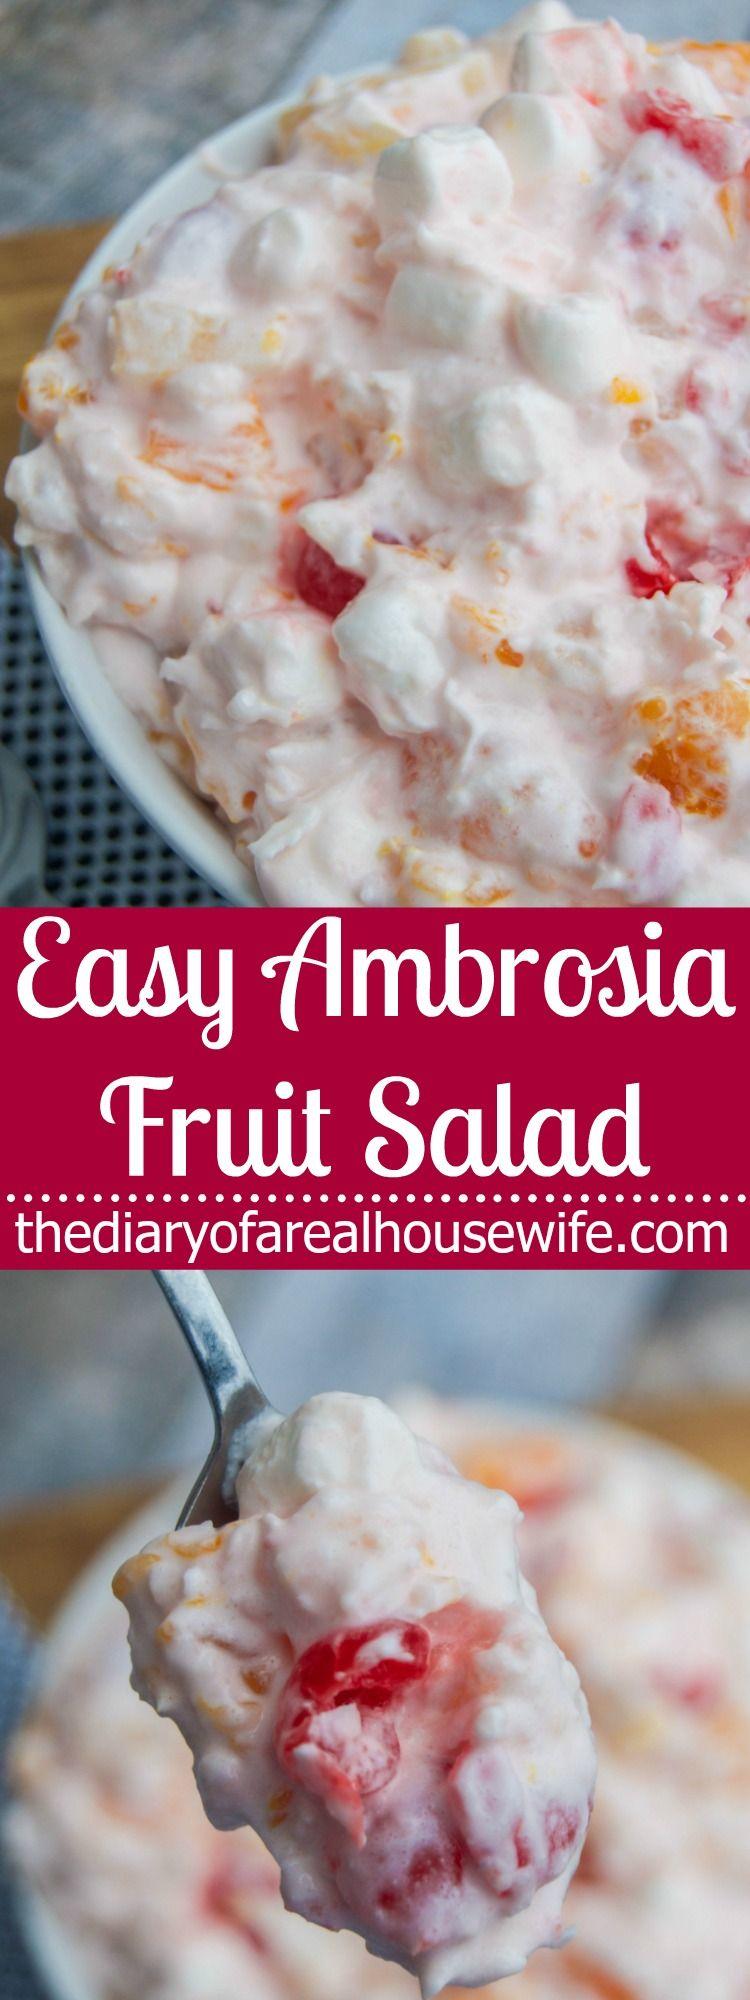 Easy Ambrosia Fruit Salad | Amazing Appetizers! | Pinterest | Salad ...